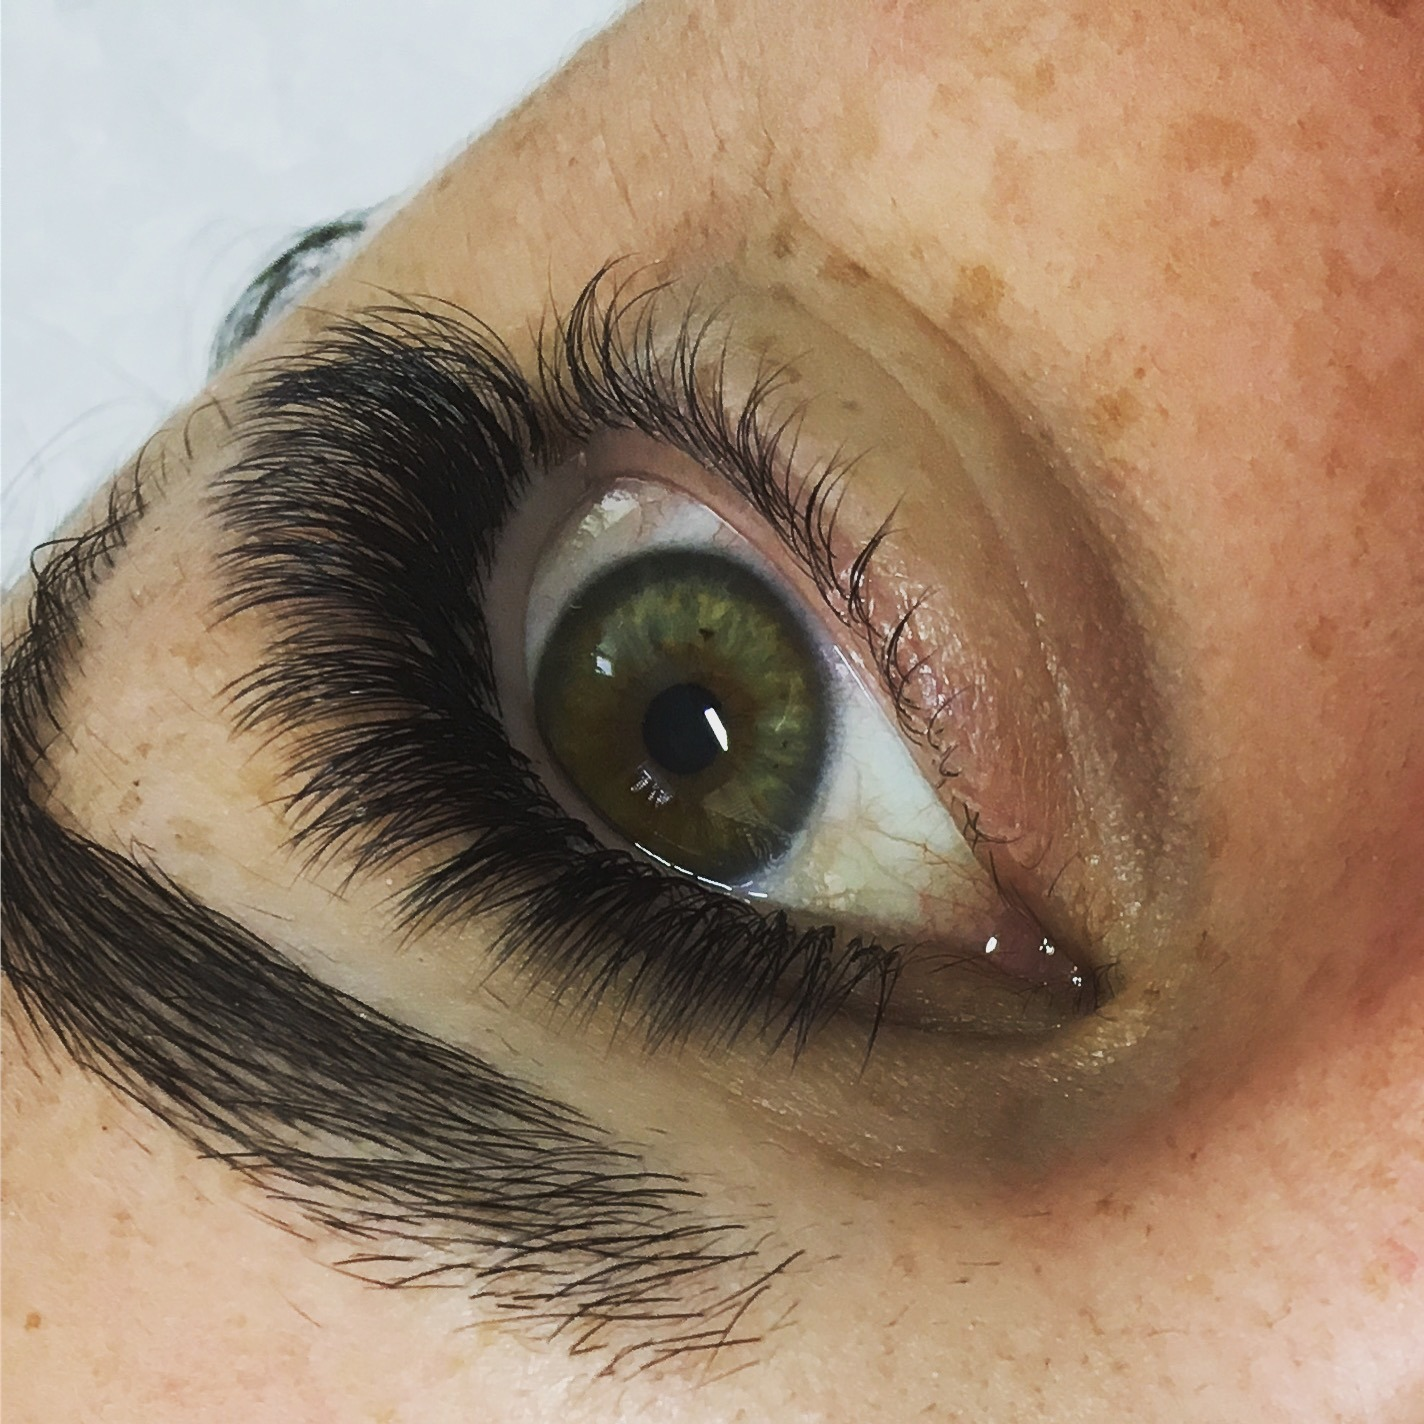 Gallery Perth Lash Boutique Eyelash Extensions Perth 0473 499